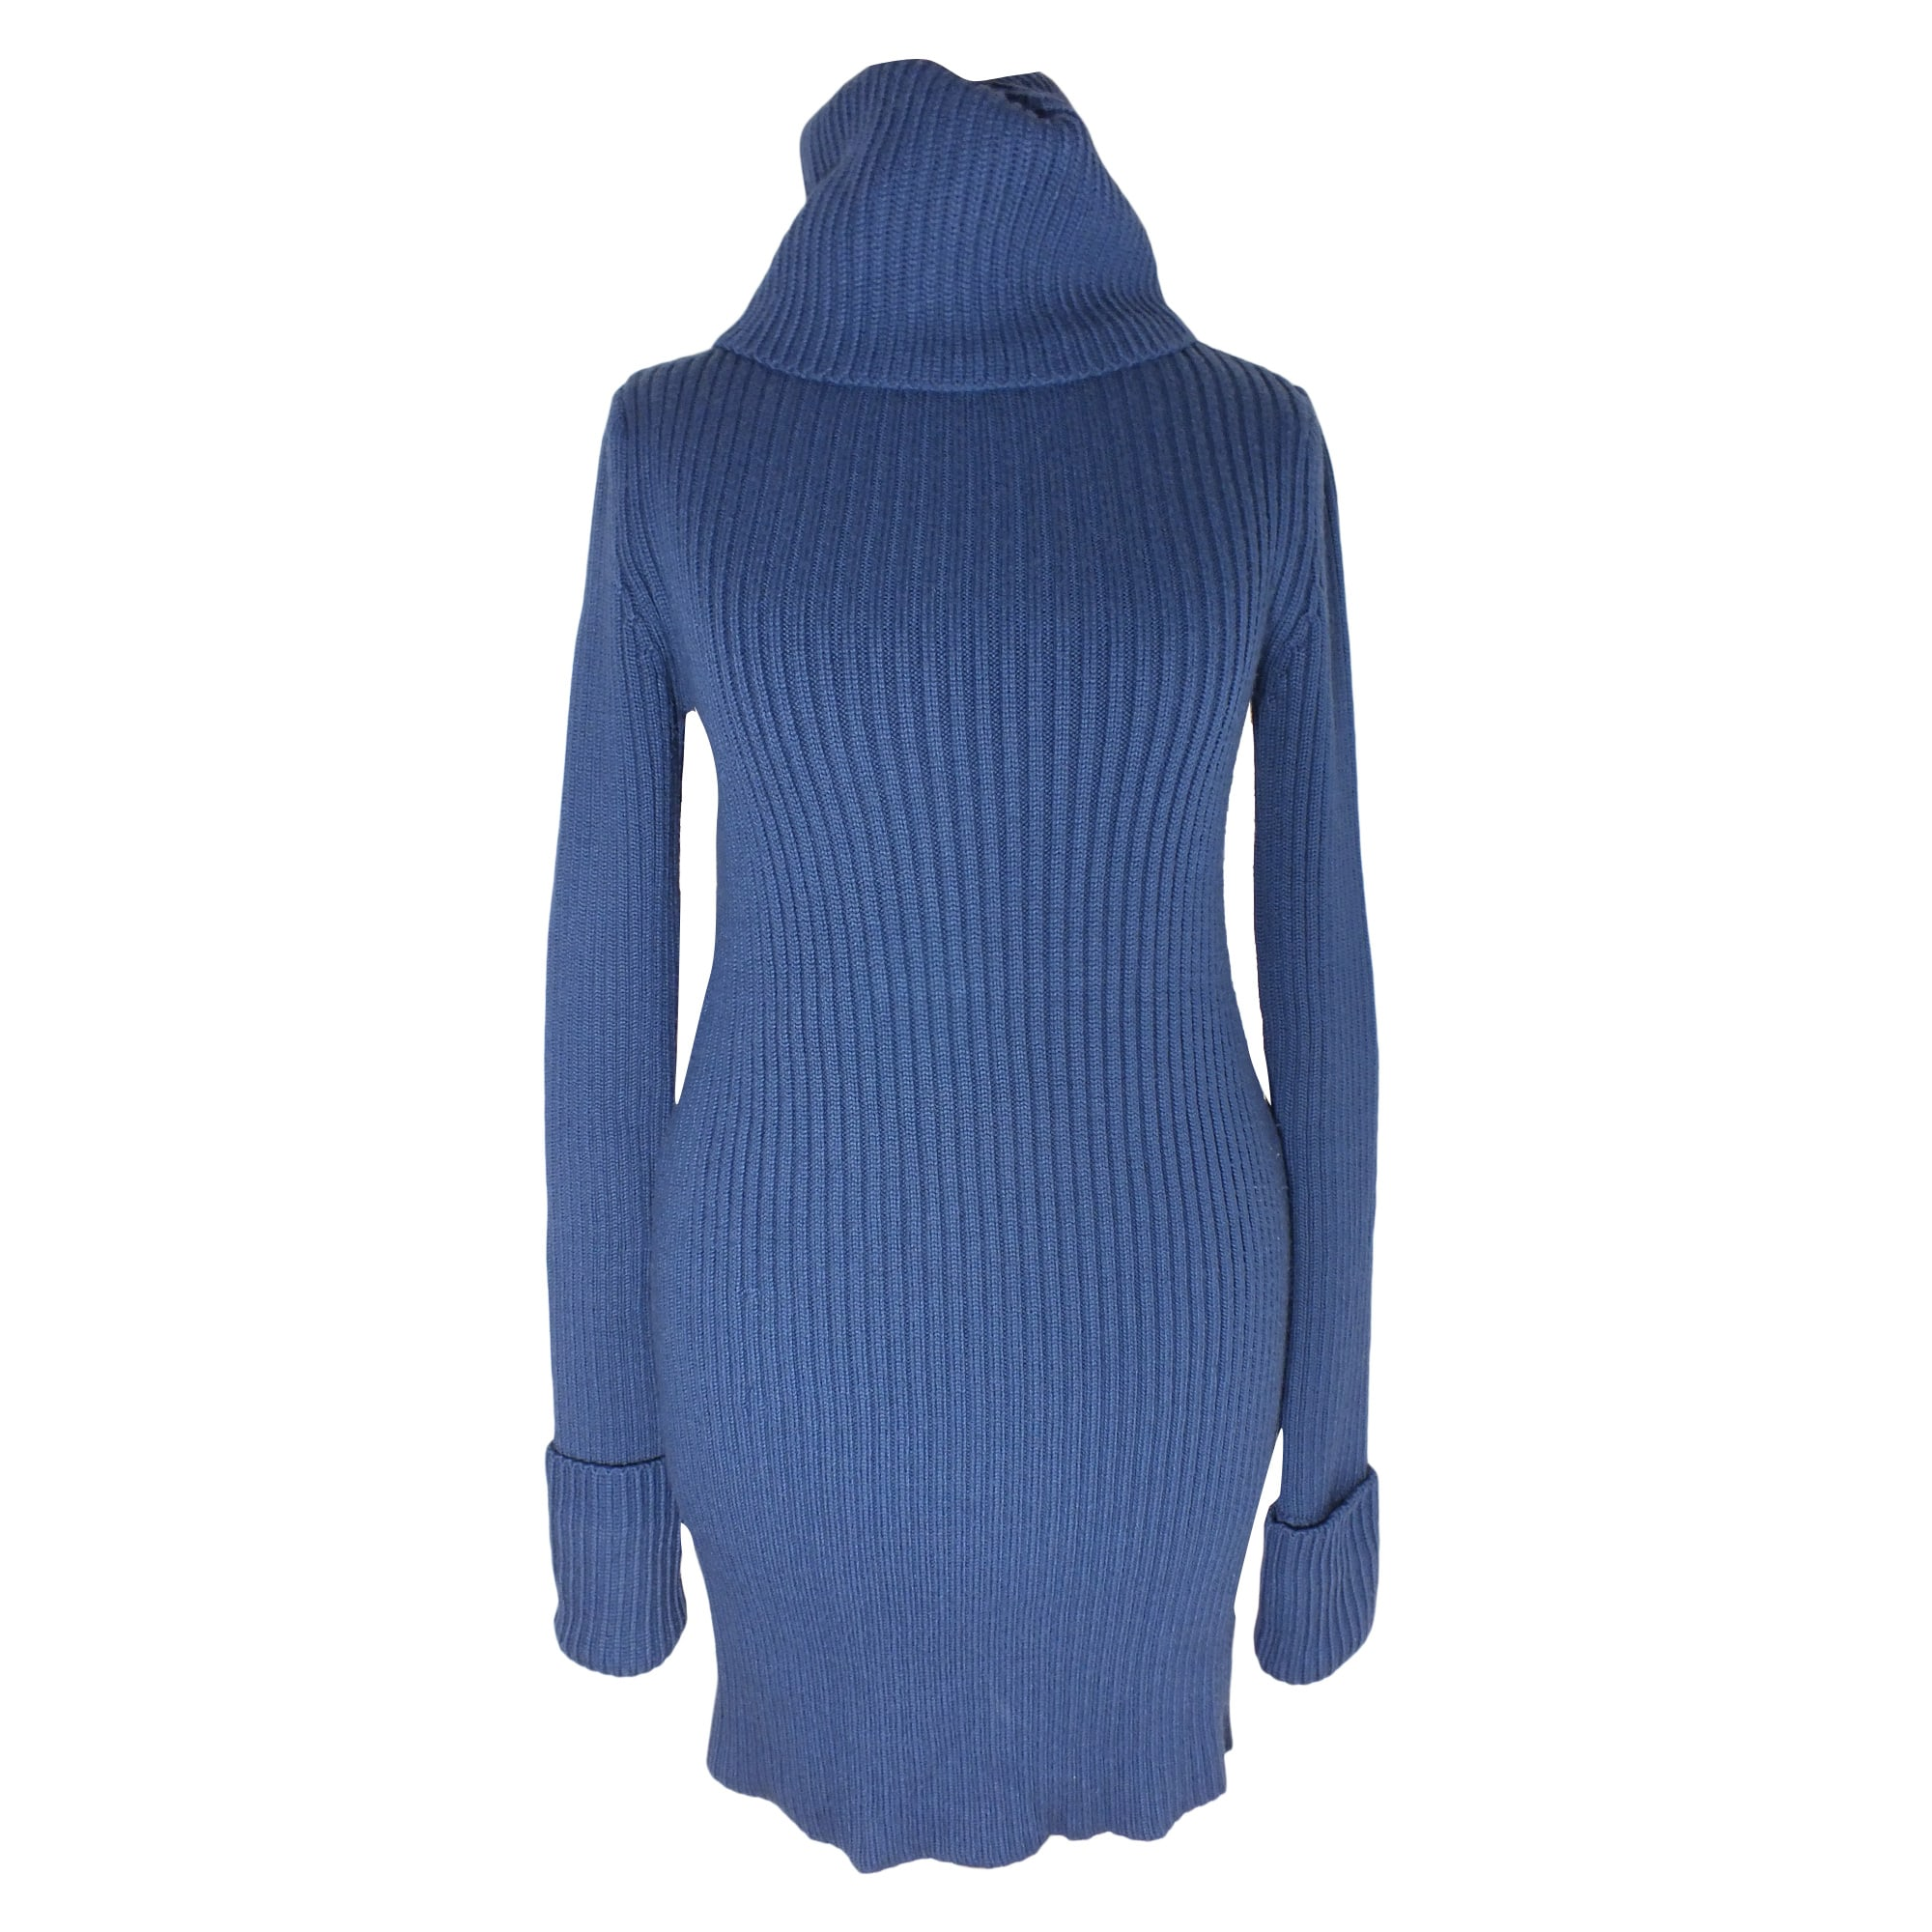 Robe tunique comptoir des cotonniers 36 s t1 bleu 6992295 - Tunique comptoir des cotonniers ...